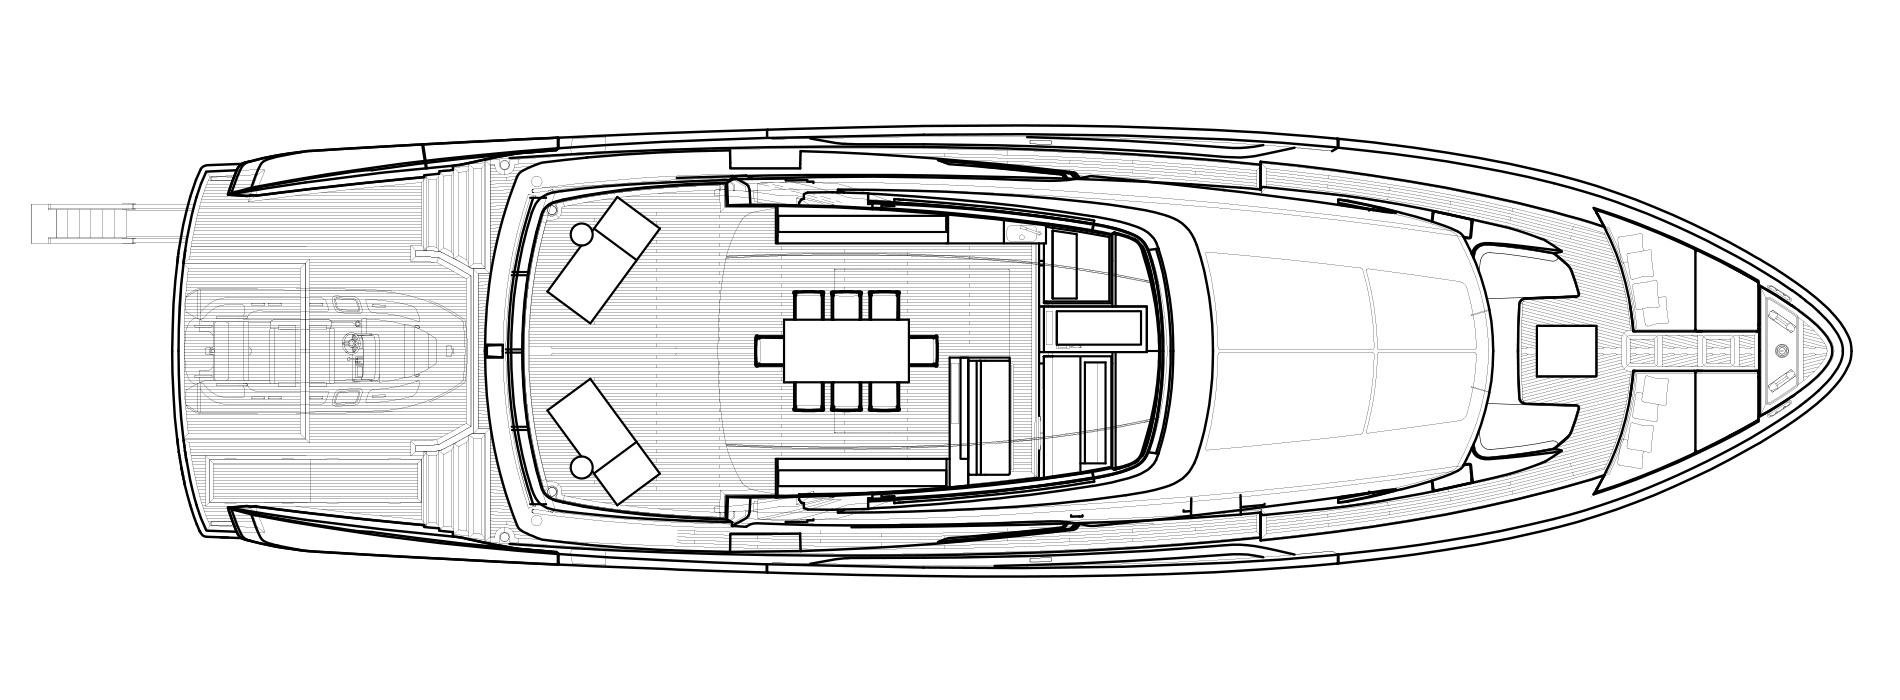 Sanlorenzo Yachts SX88 飞桥 Versione Lissoni